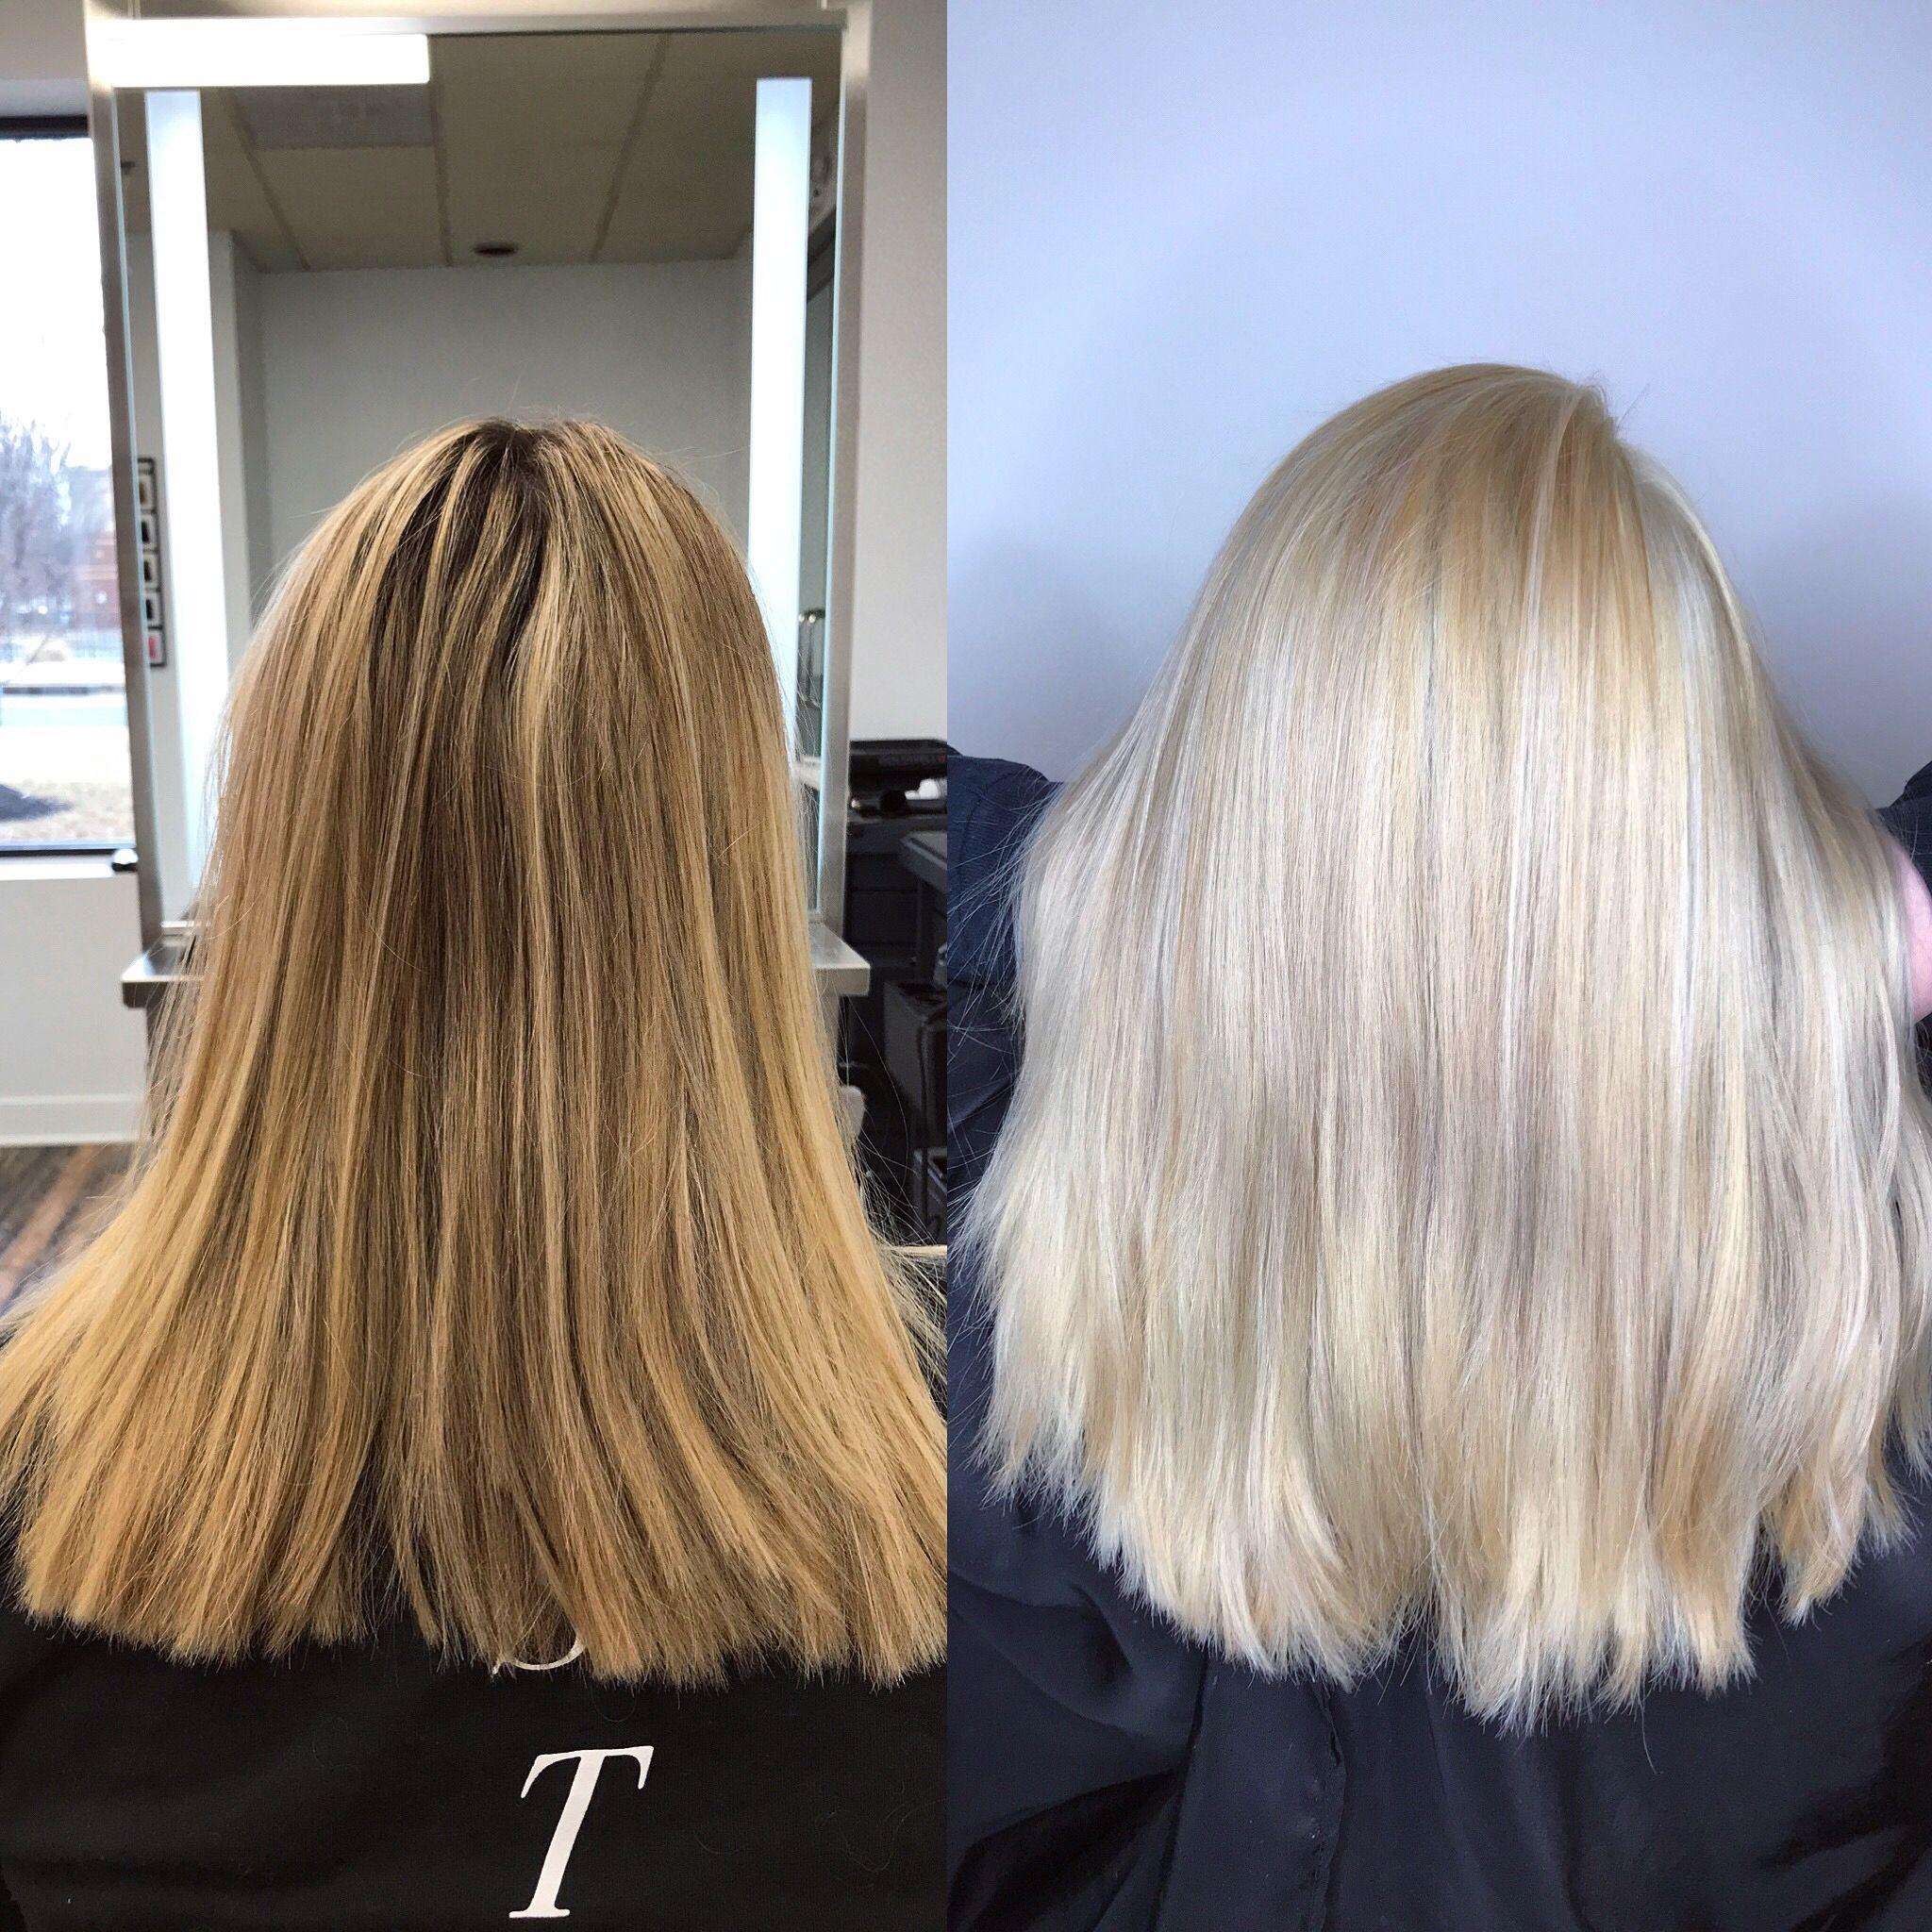 Before And After Blonde Bleach Out And Tone Used Fanola No Yellow Shampoo Full Highlight Balayage Follow Me At Balayage Hair Hair Videos Balayage Hair Dark